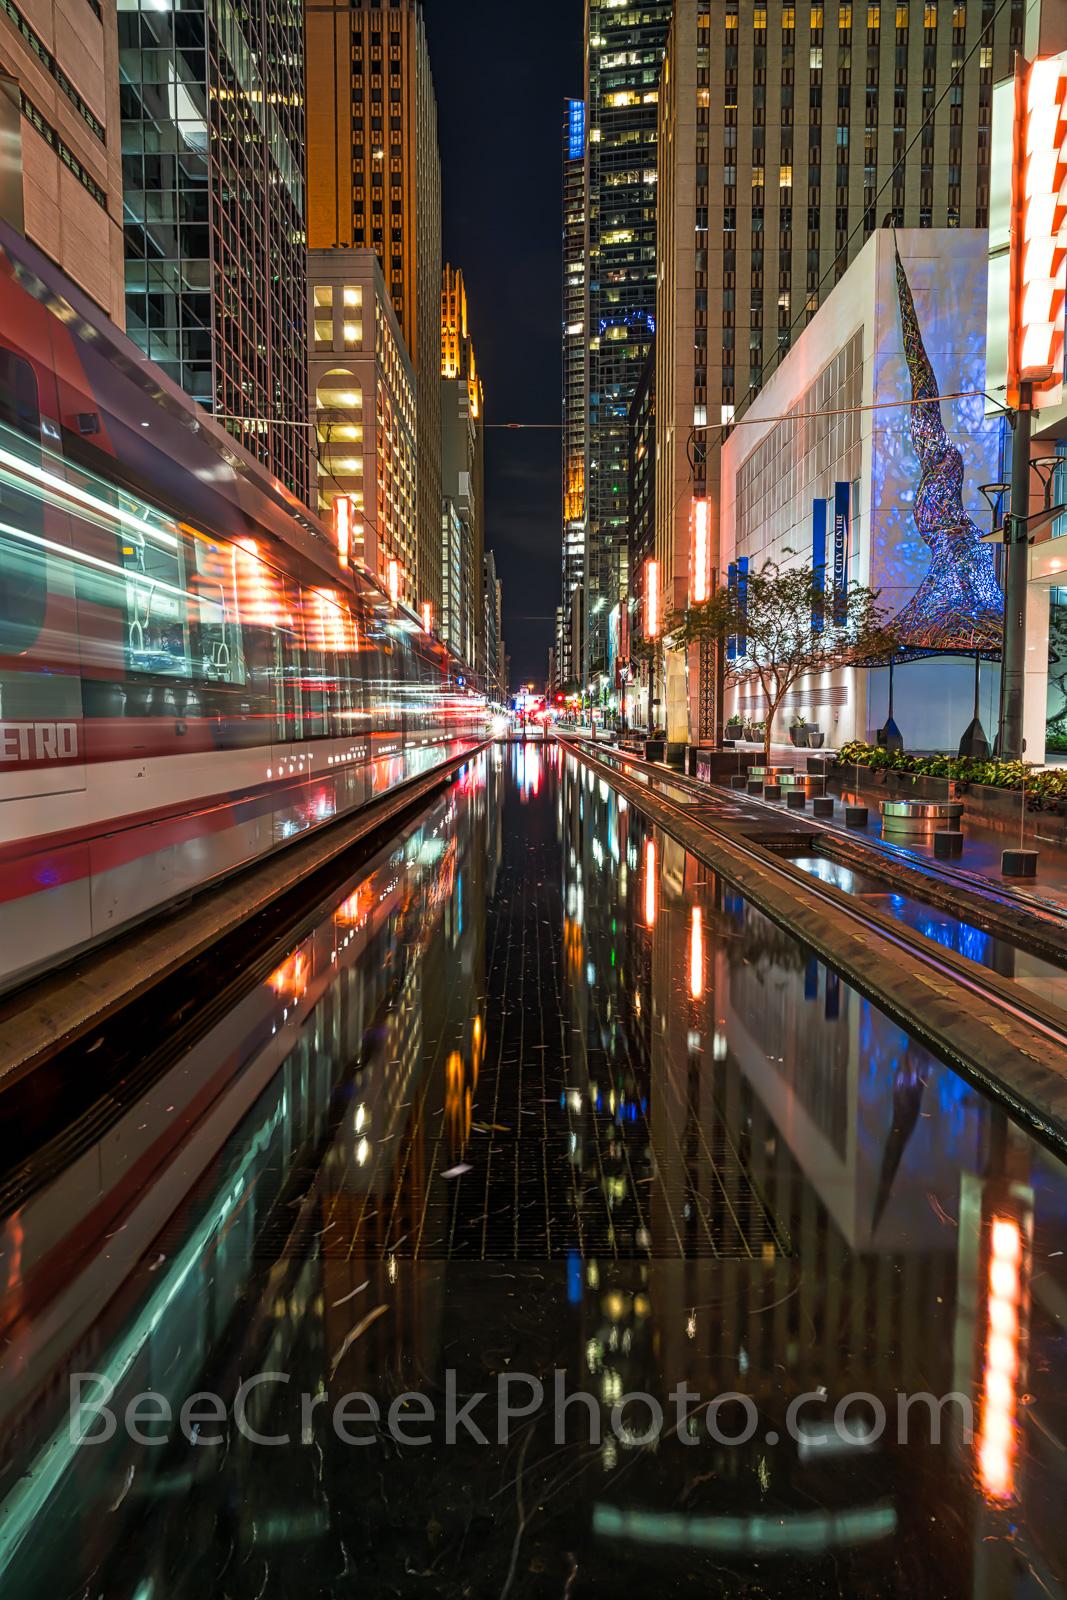 Houston, rail, mass transit, dark, night, purple lights, city, skyline, downtown, cityscape, street scene, high rise, buildings, water, purple art piece, Houston stock, , photo